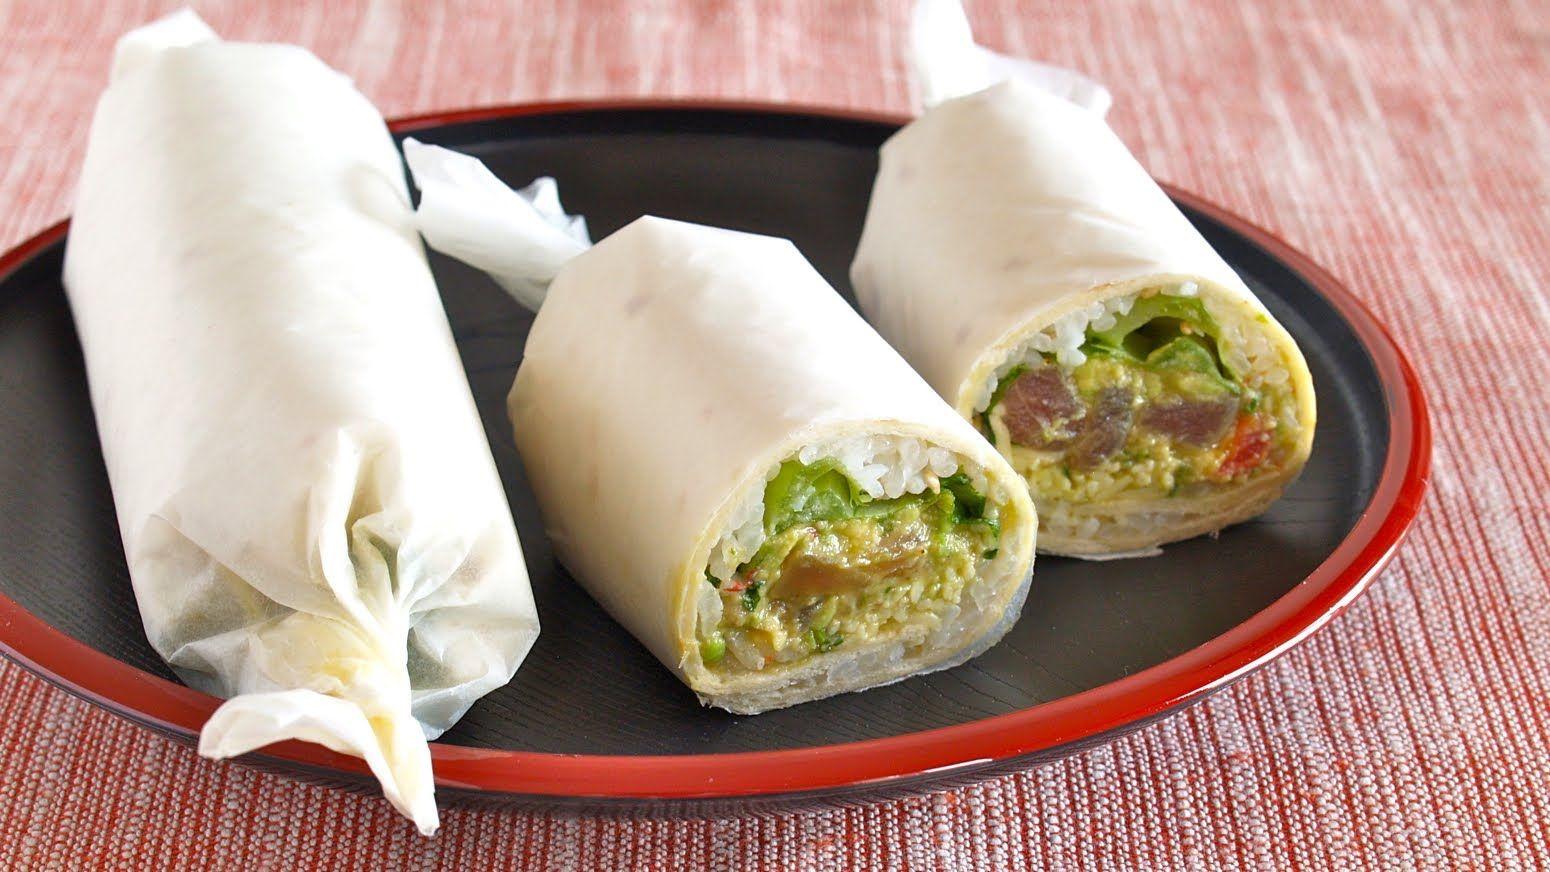 Httpsyoutubewatchvz1qtikpvu9q food porn pinterest create eat happy kawaii japanese recipes and cooking hacks how to make sushi burrito video recipe forumfinder Gallery